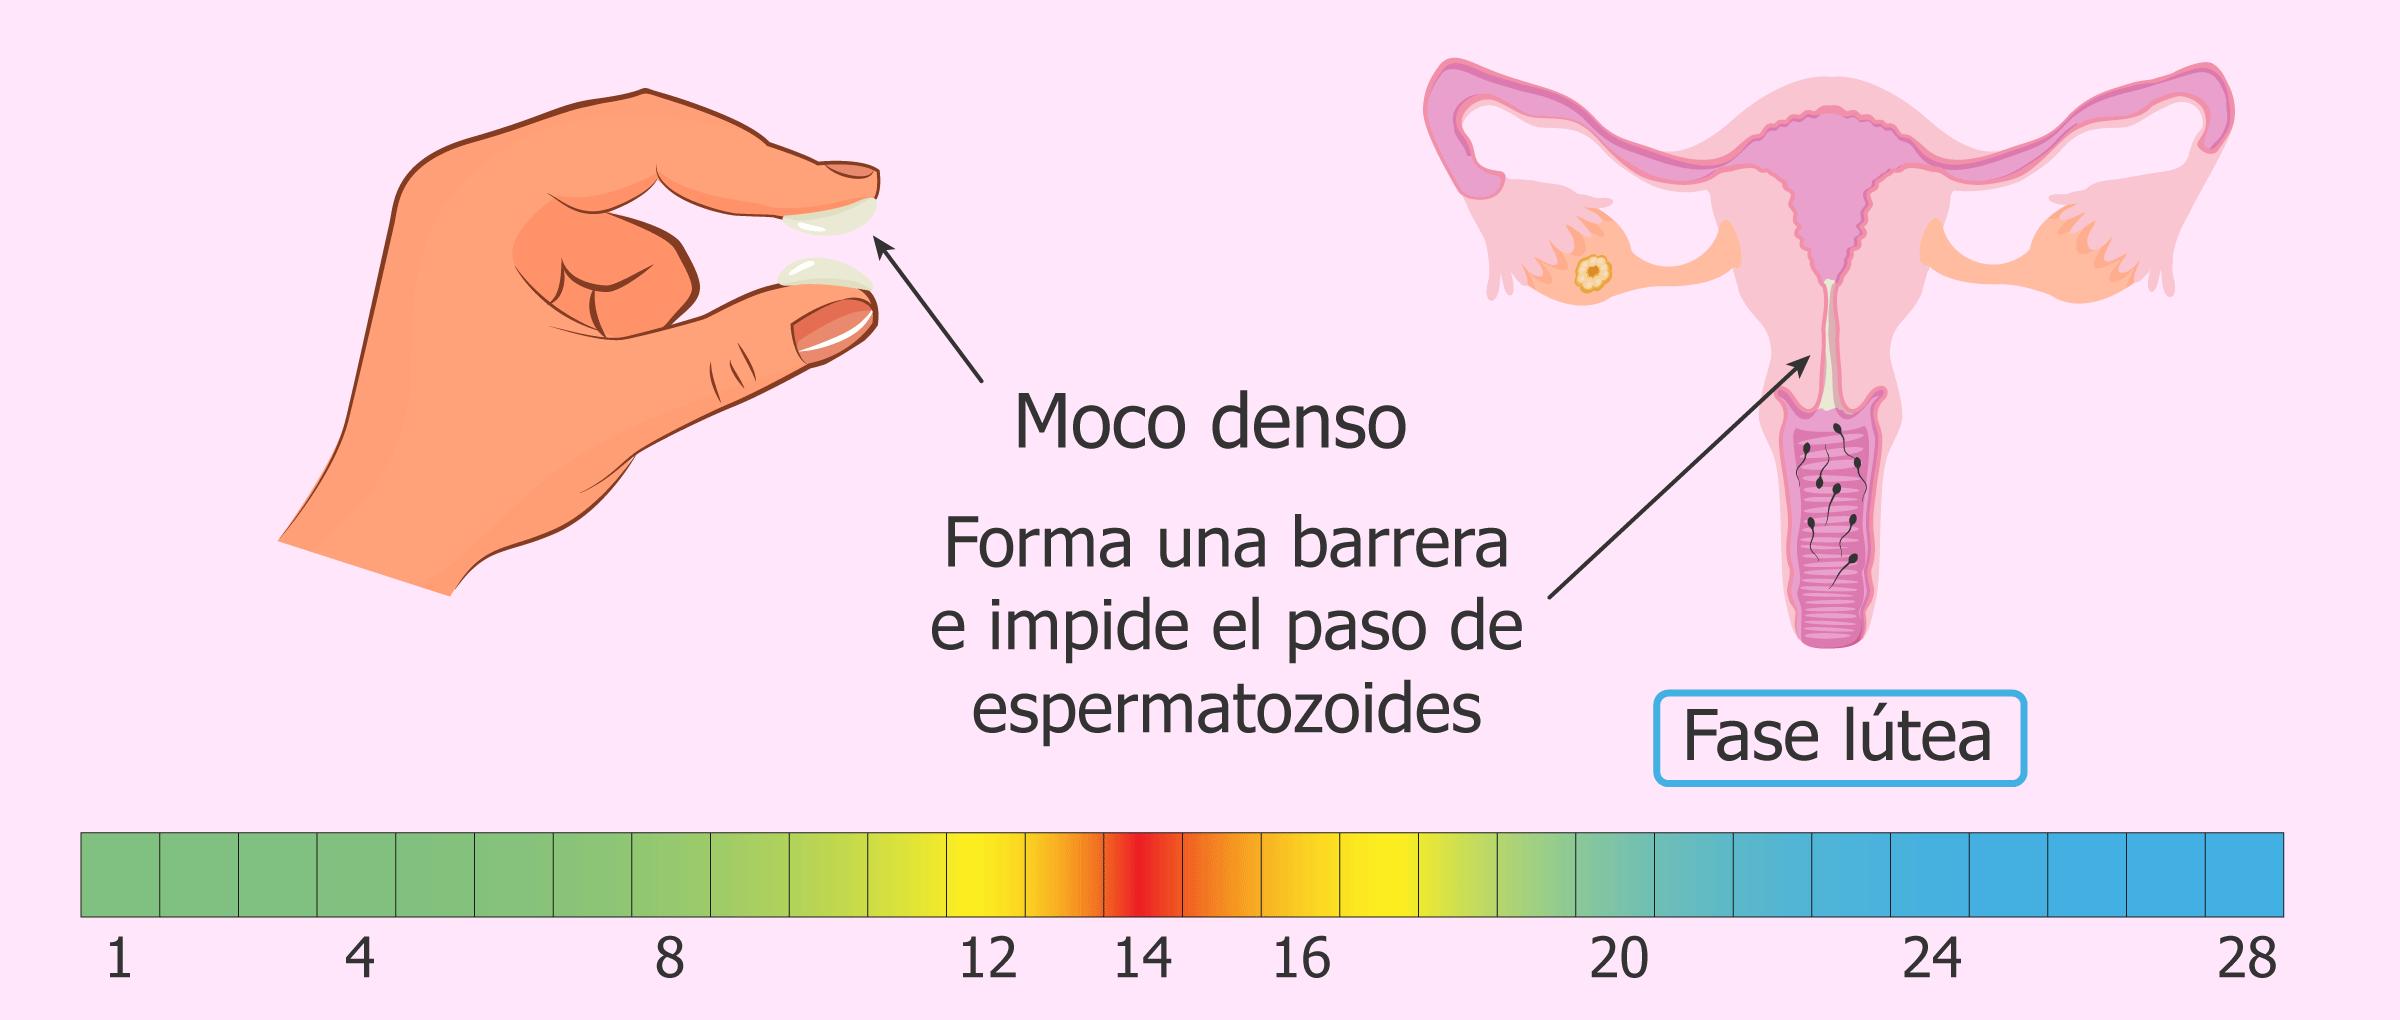 Imagen: Moco cervical en la fase lútea